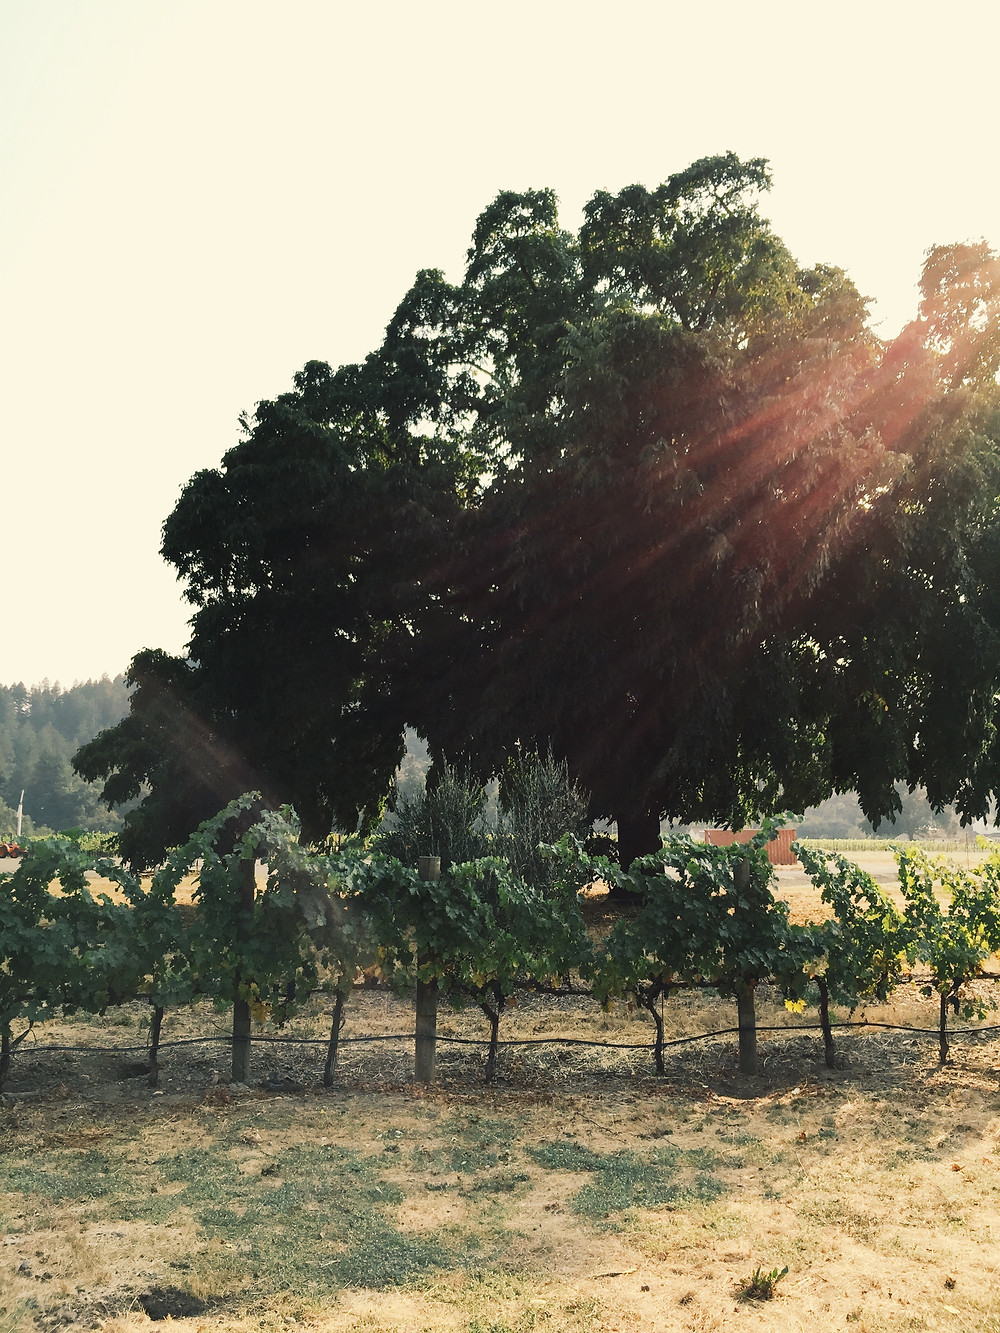 Morning sun hitting Work Winery, Calistoga